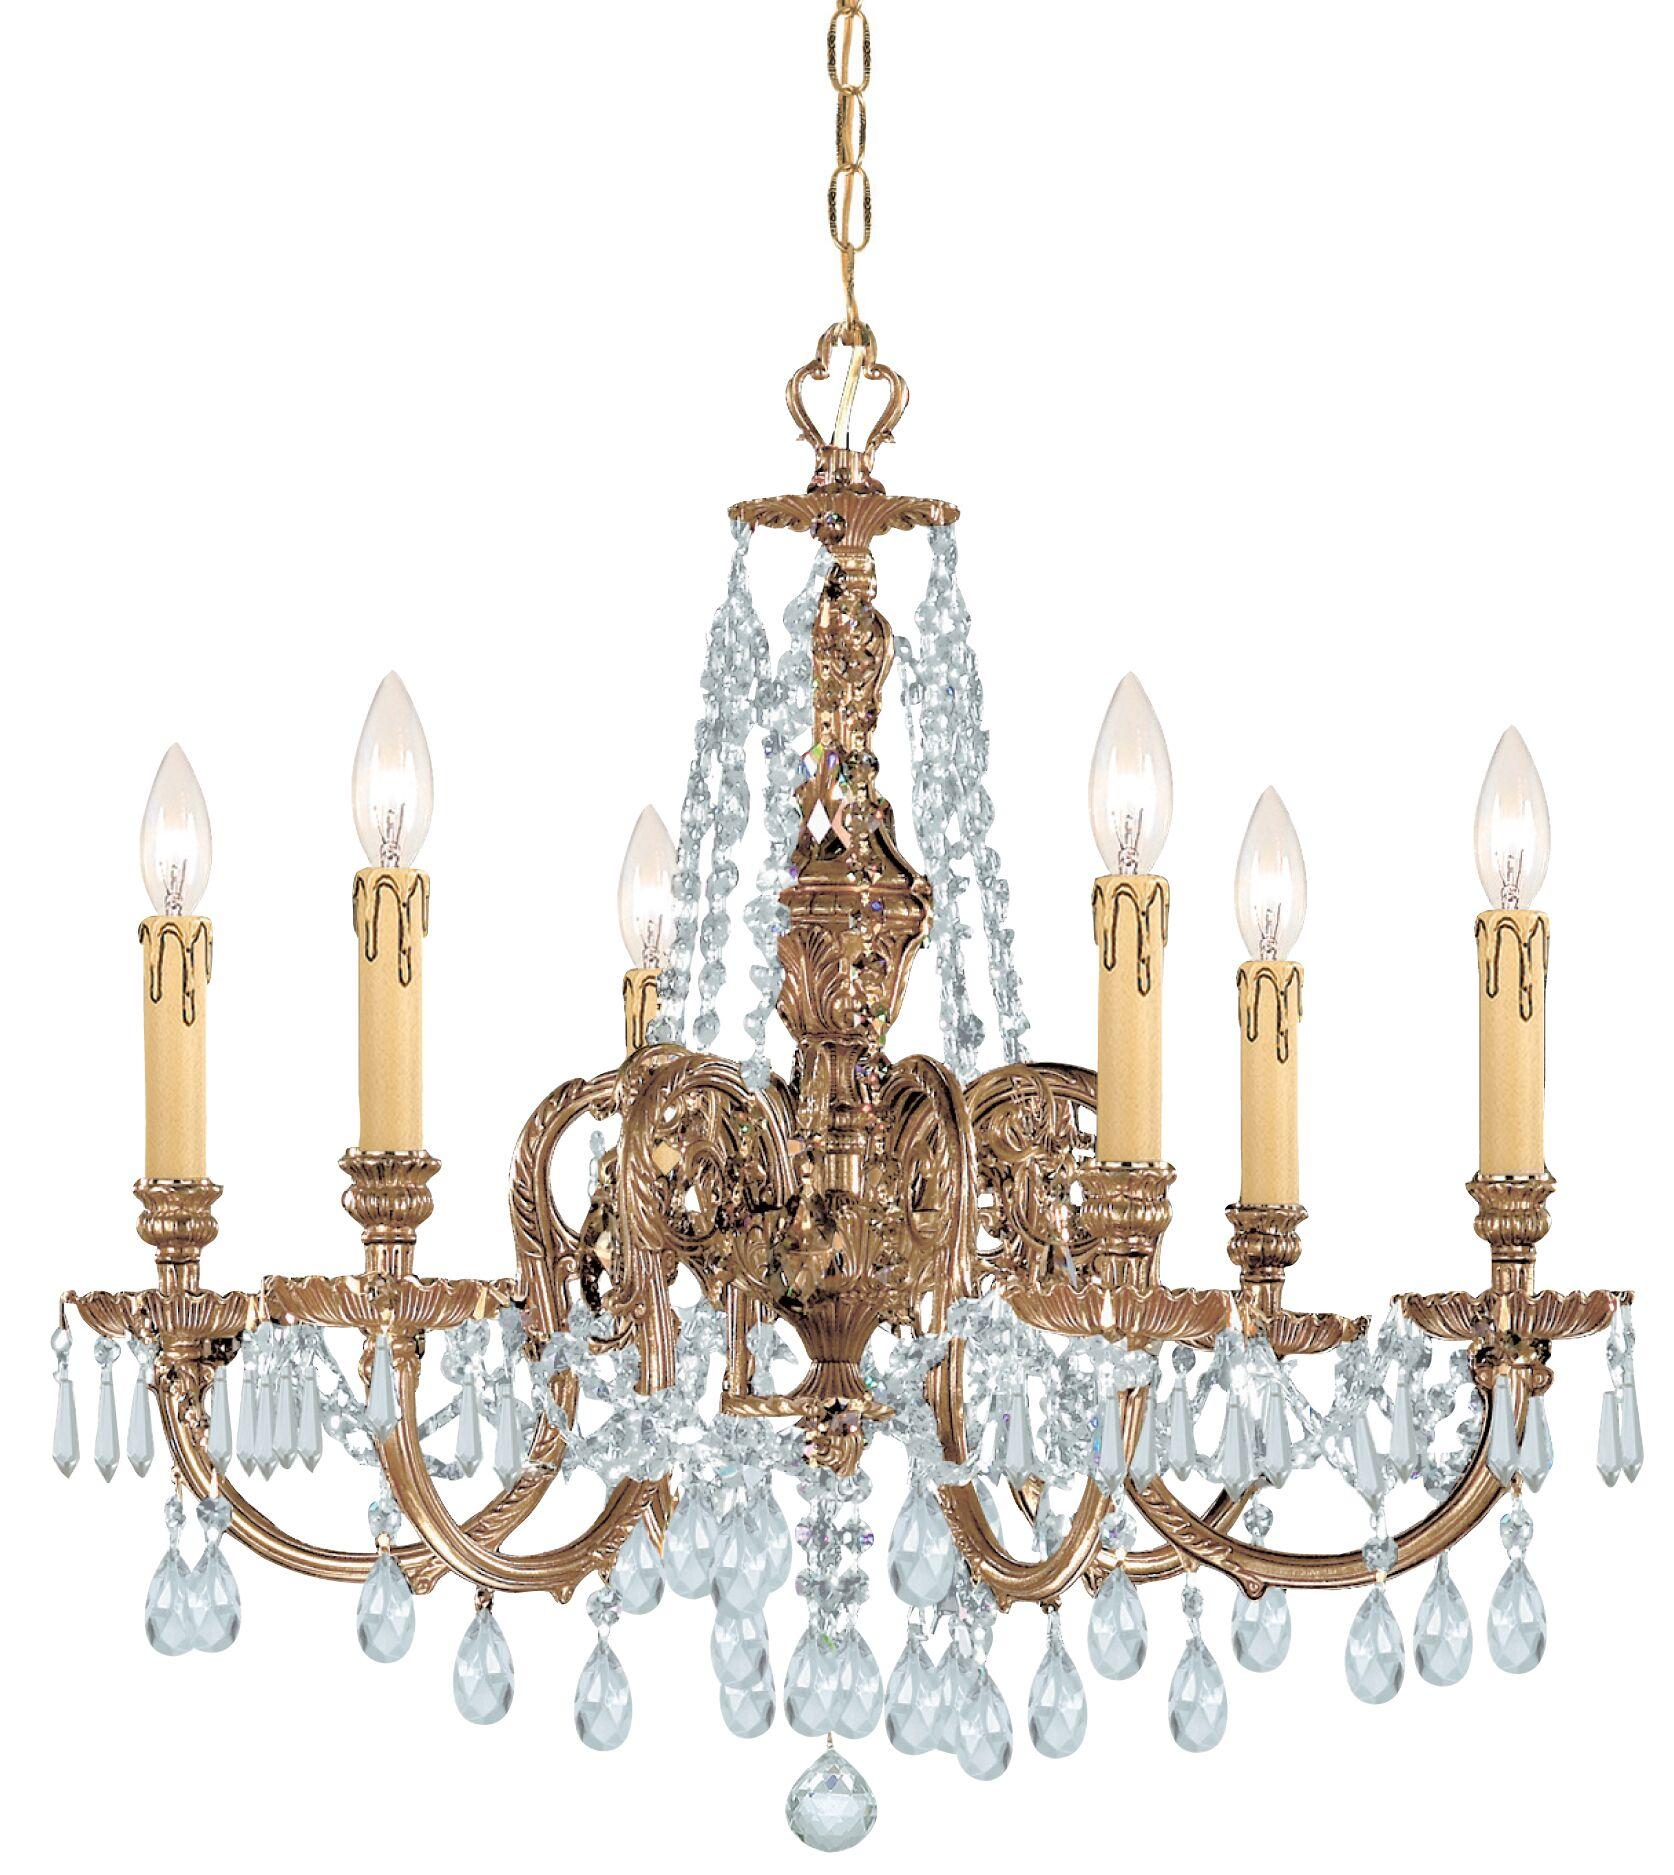 Aureolin 6-Light Crystal Chandelier Crystal Type: Swarovski Strass